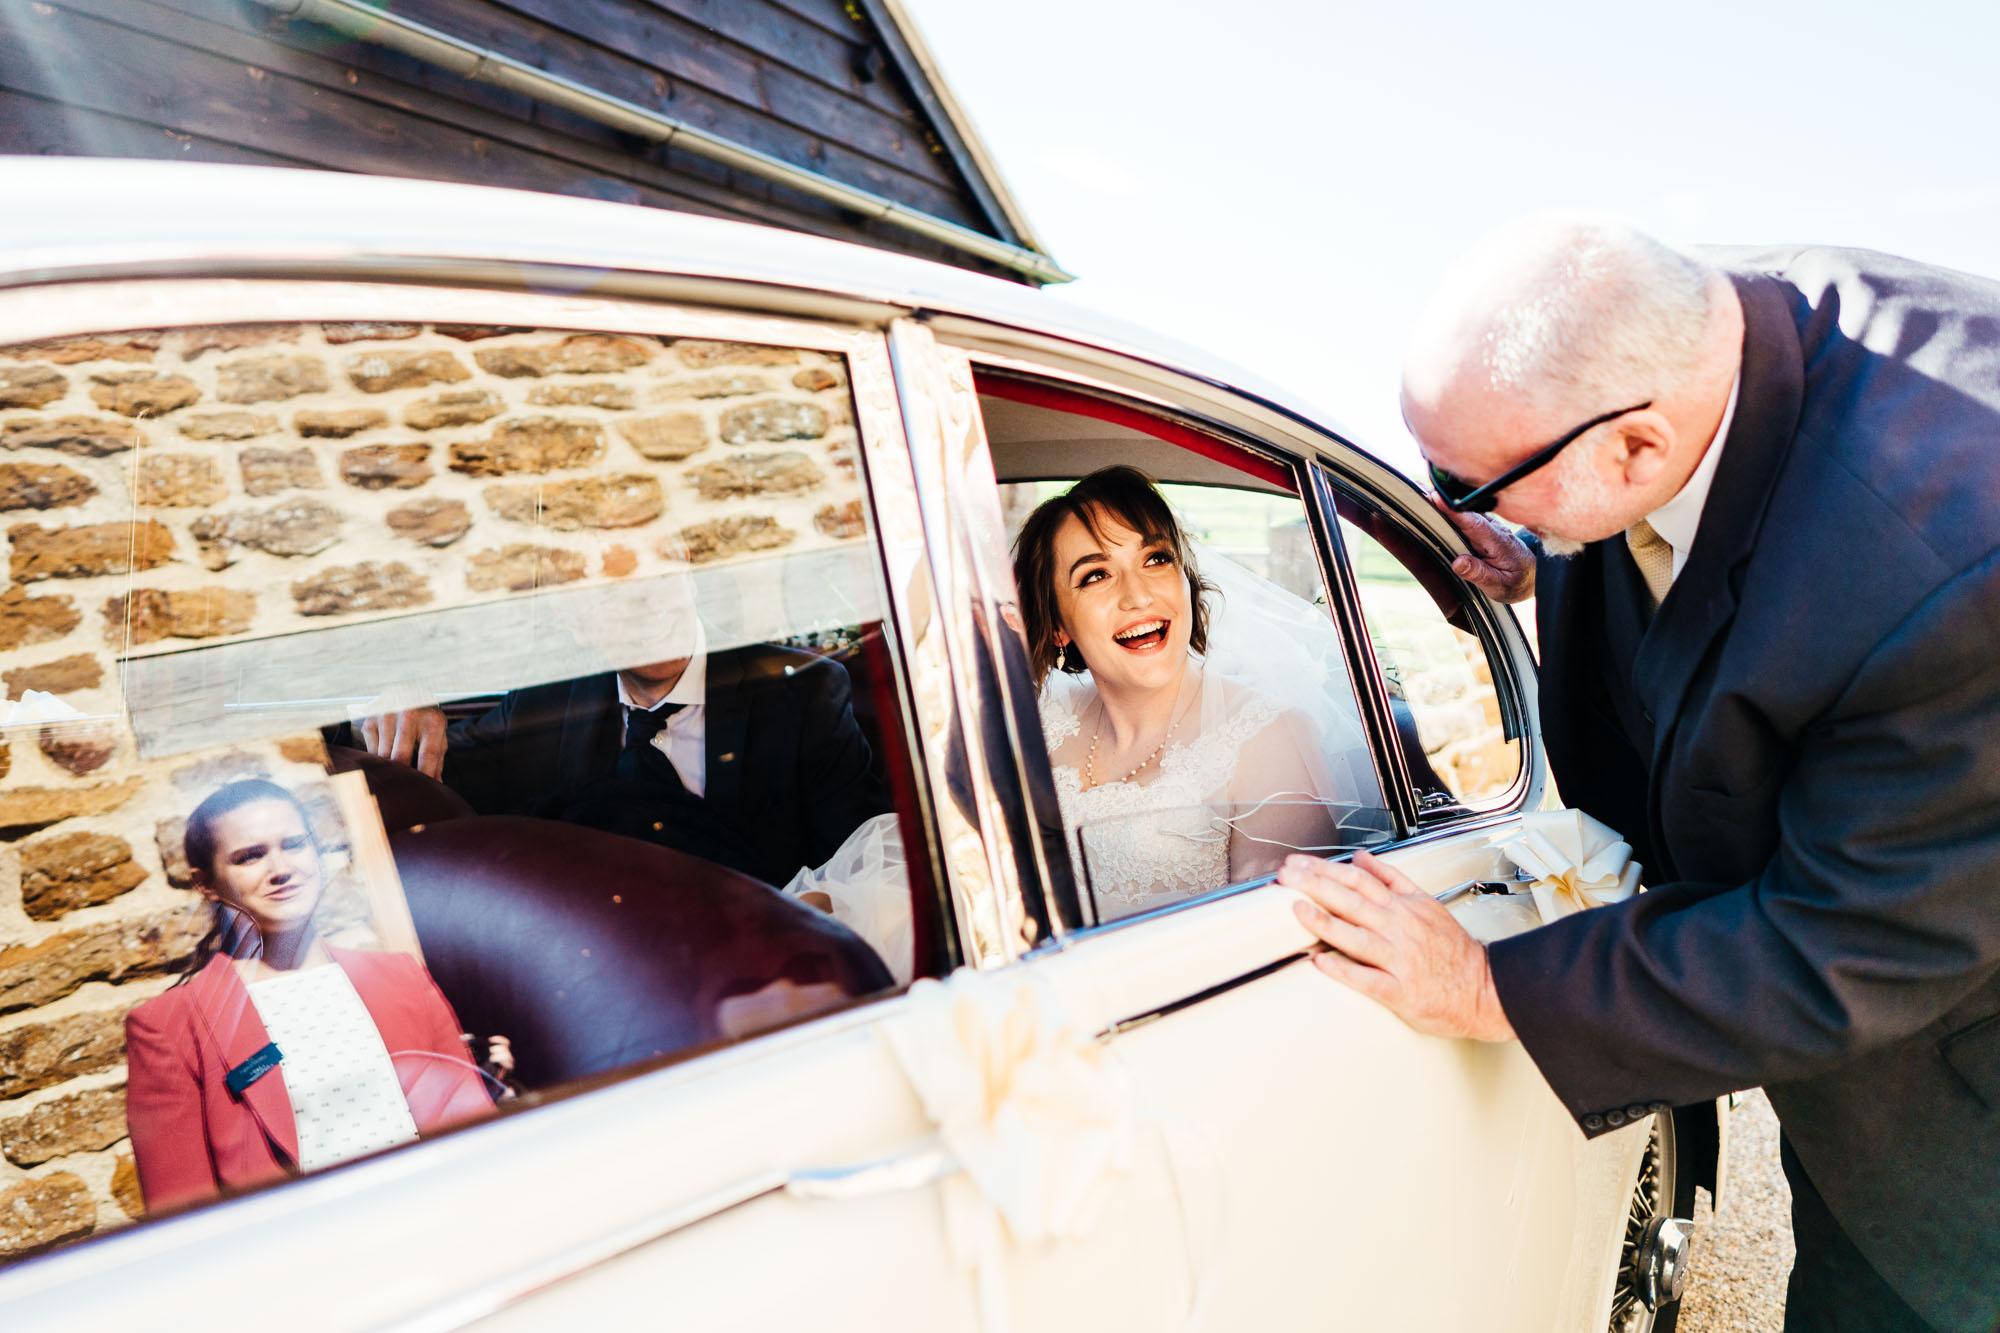 wedding-at-dodford-manor-24